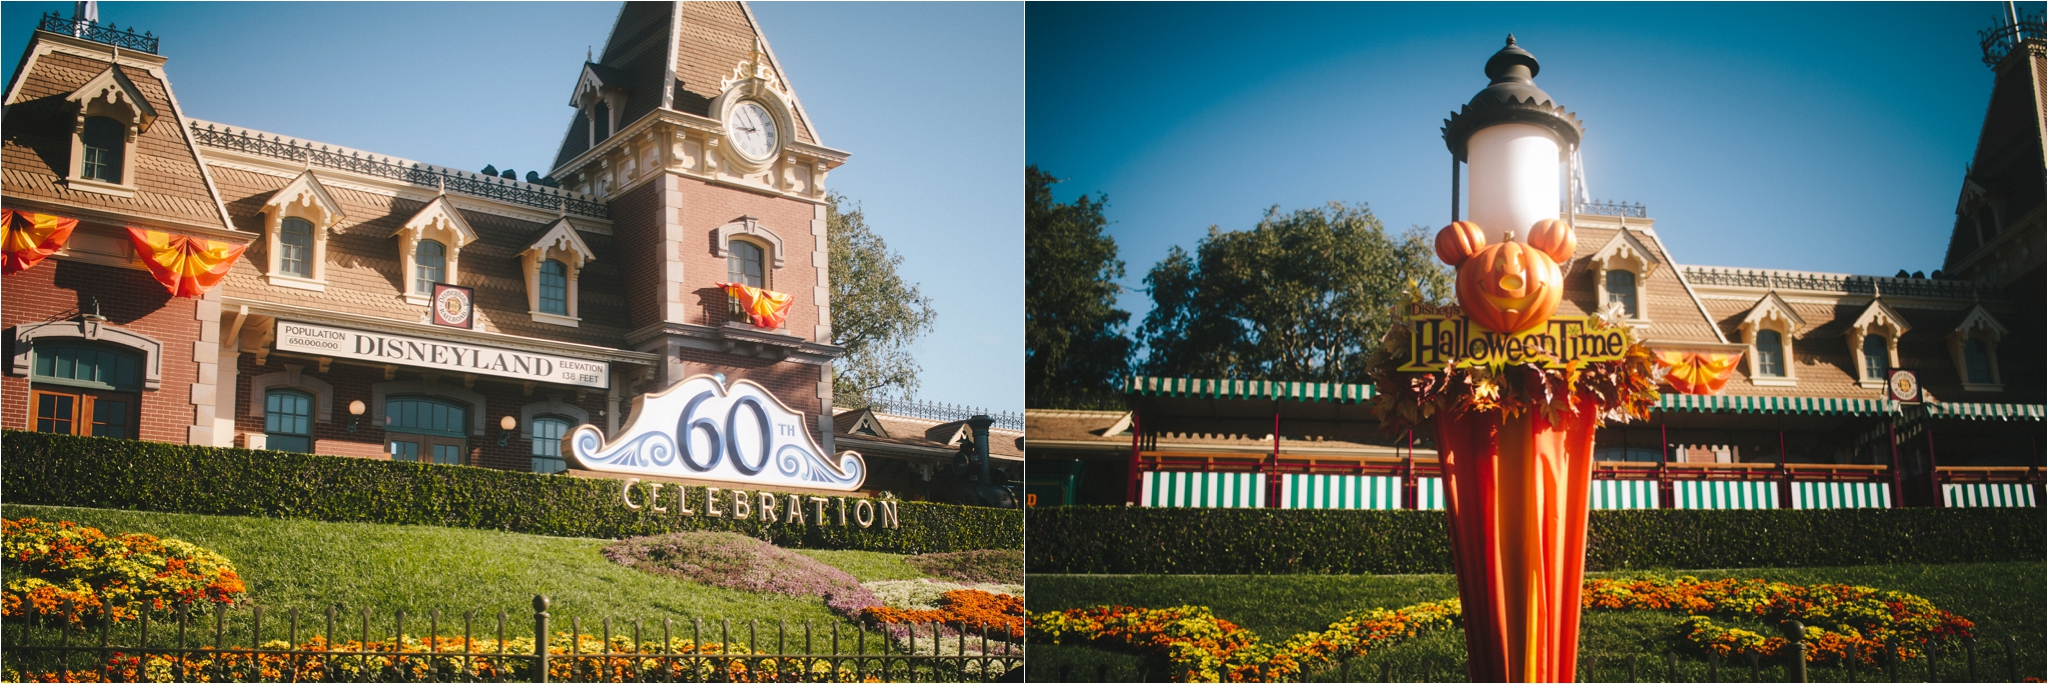 Disneylandroundtwopersonalimages_0002.jpg